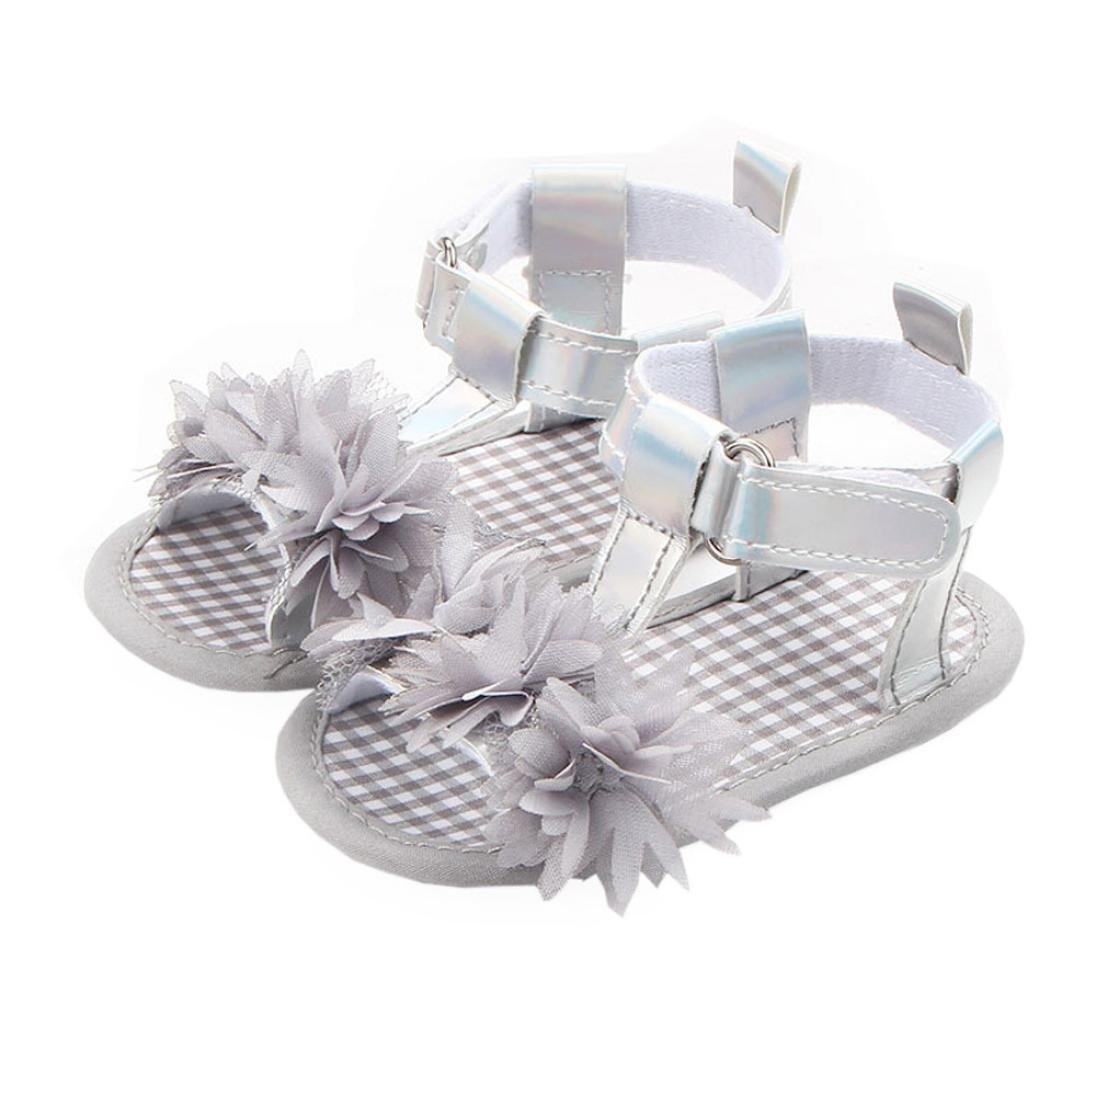 WARMSHOP Fashion Princess Single Shoes Flower Checked Soft Sole Sandals Shoes